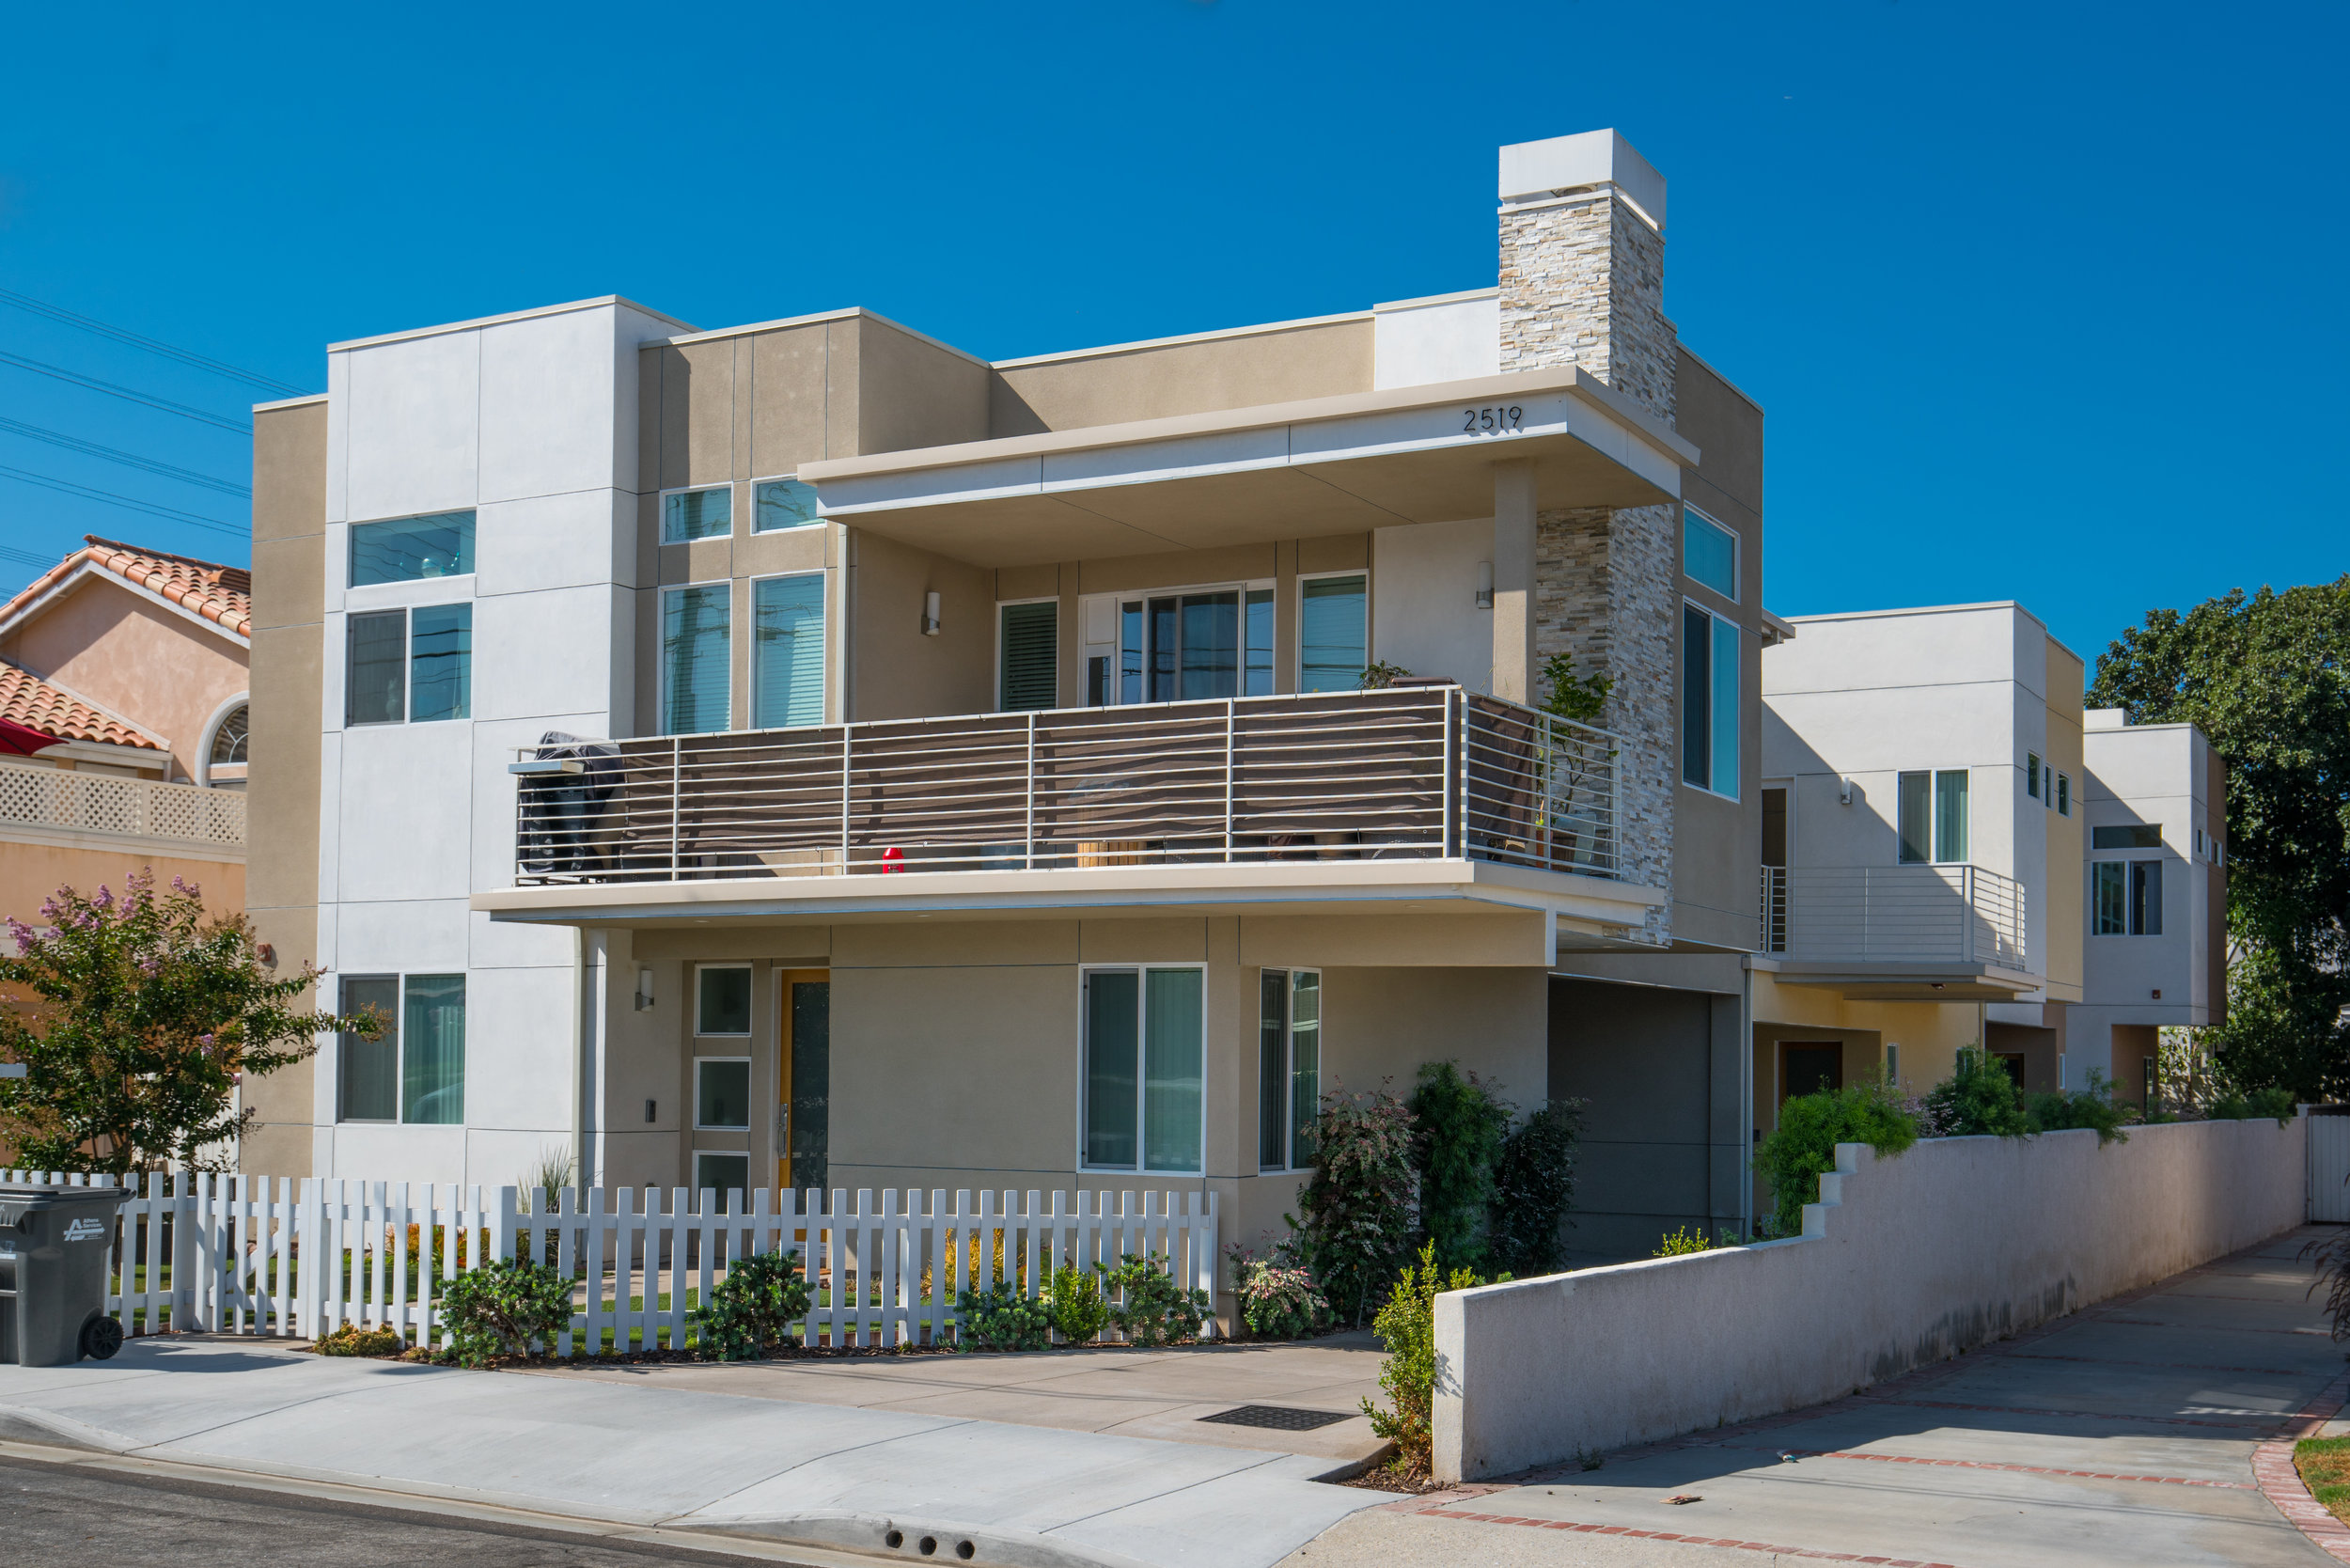 180909-07187 2519 Rockefeller Redondo Beach (1).JPG